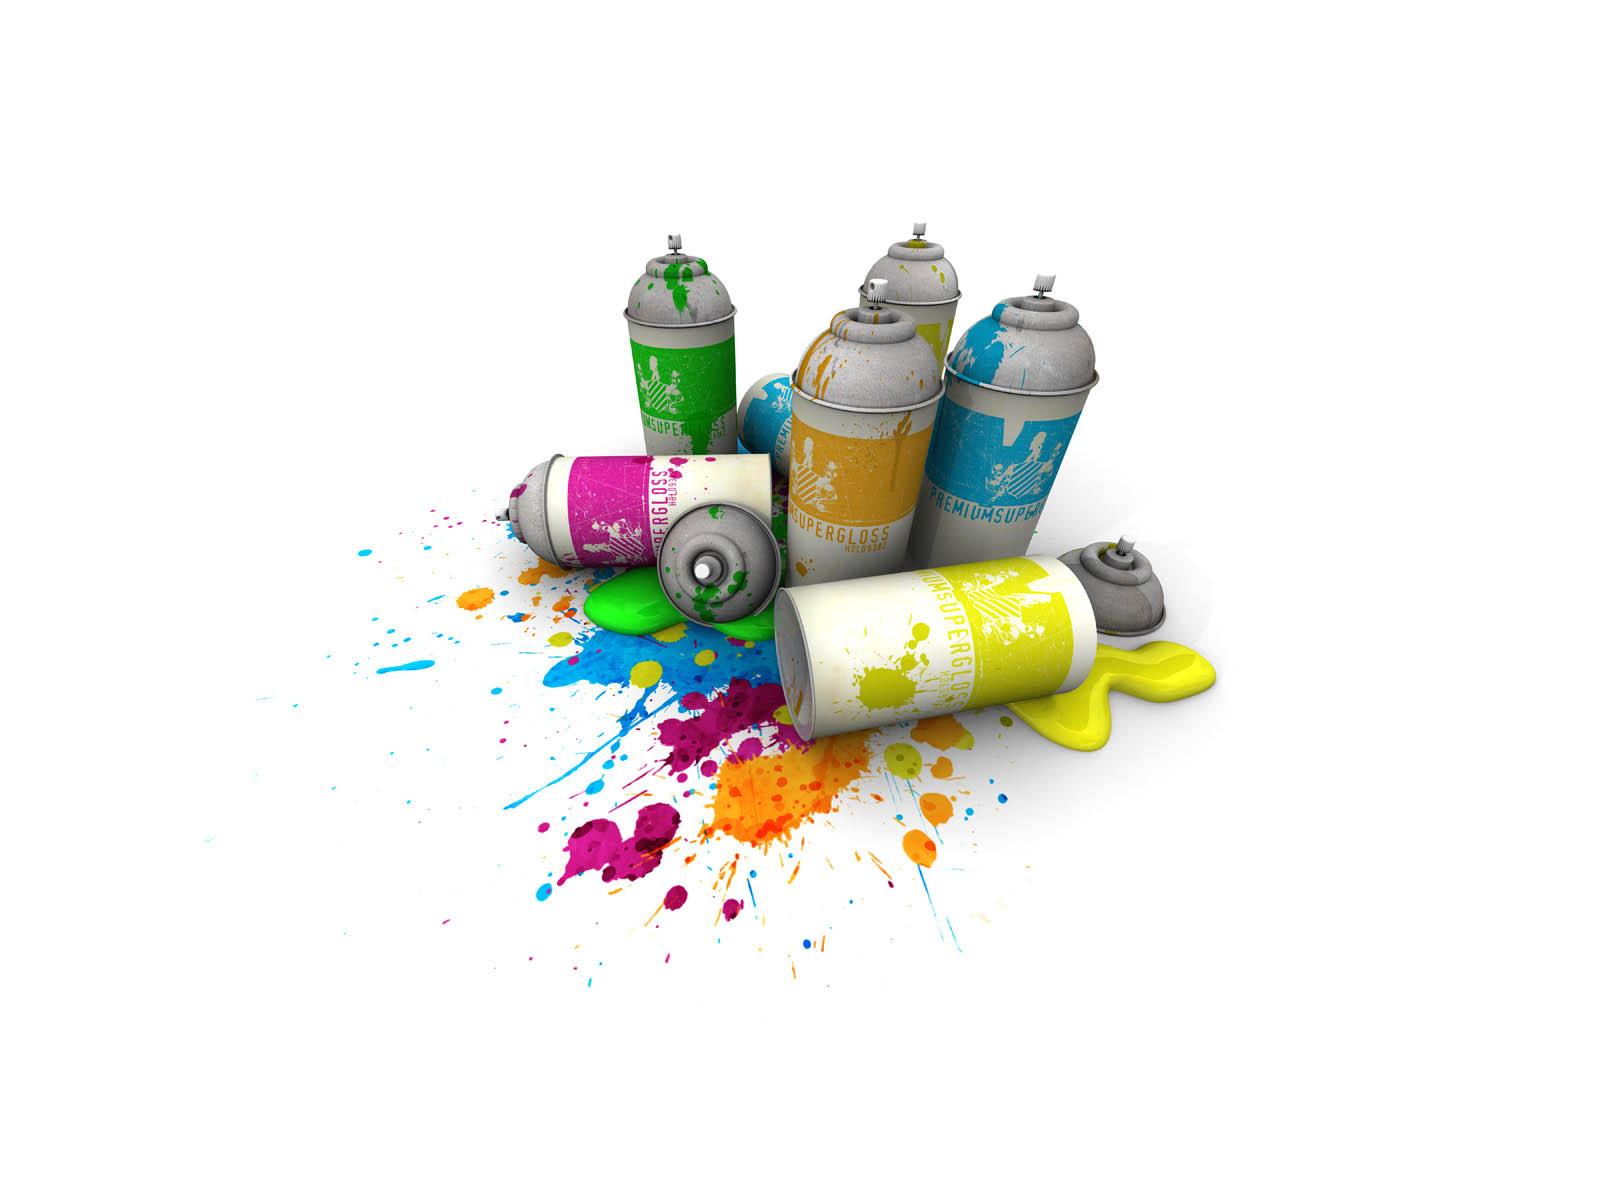 http://3.bp.blogspot.com/-kwr61cZ8Wfw/UJUn-181siI/AAAAAAAANRM/t88MvzlGYgs/s1600/White+Desktop+Wallpapers+and+Backgrounds+2.jpg